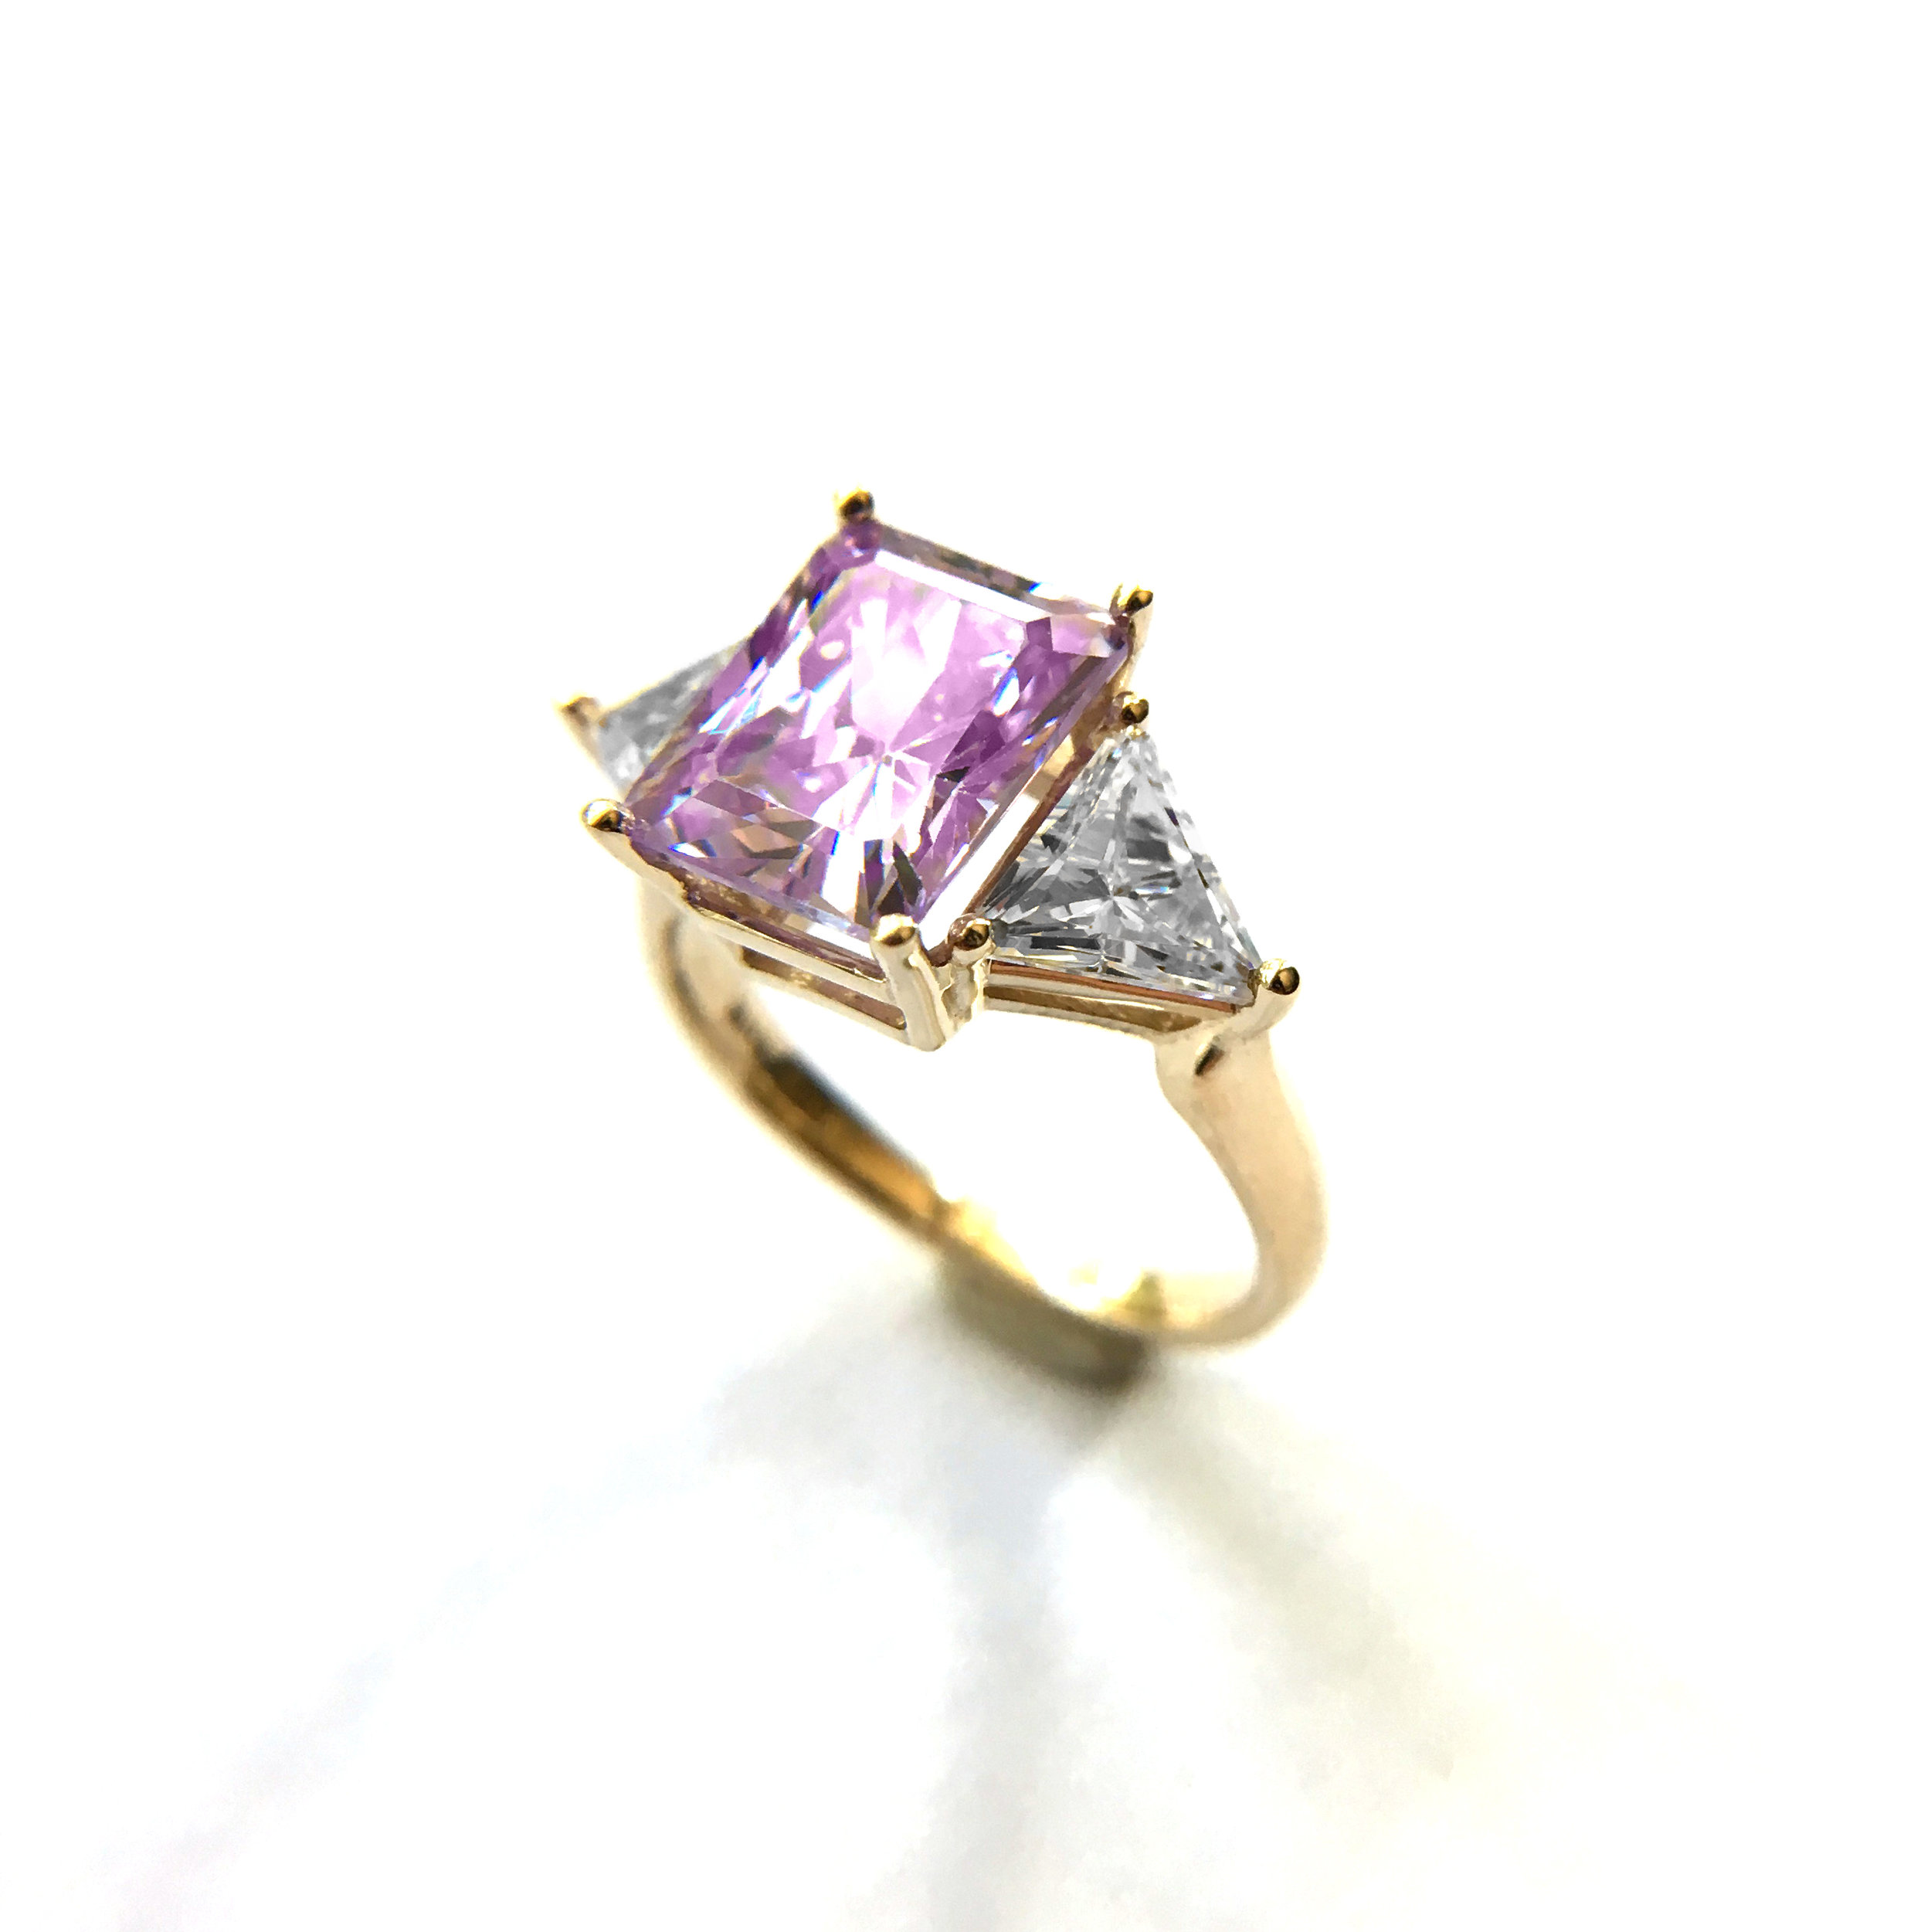 14k Yellow Gold Art Deco 3 Stone Engagement Ring